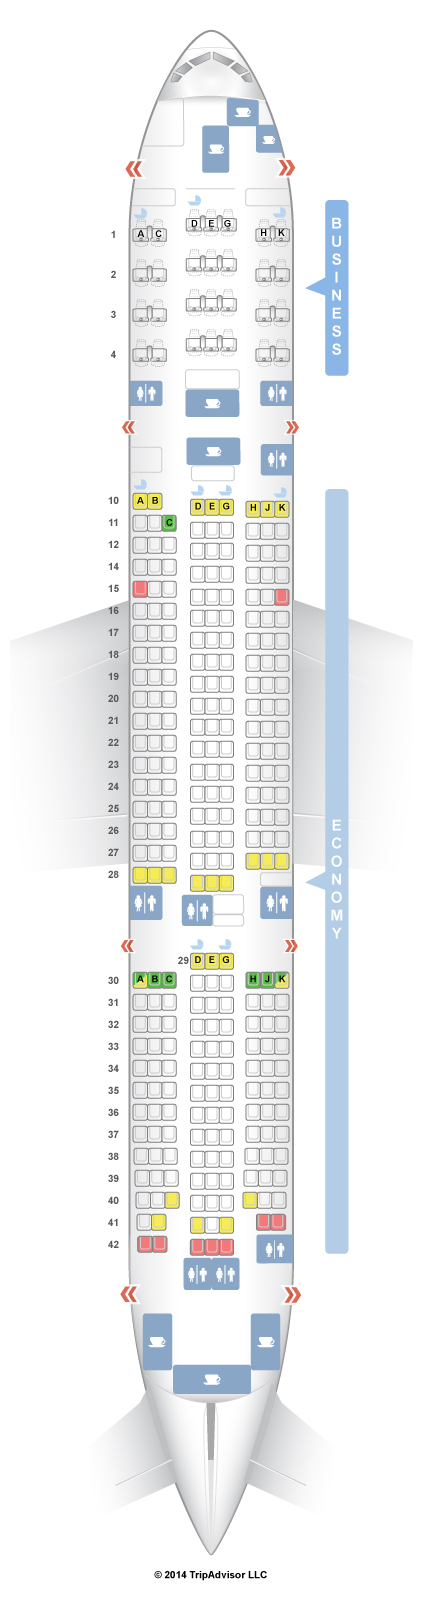 SeatGuru Seat Map Asiana Boeing 777-200ER (772) Layout 2